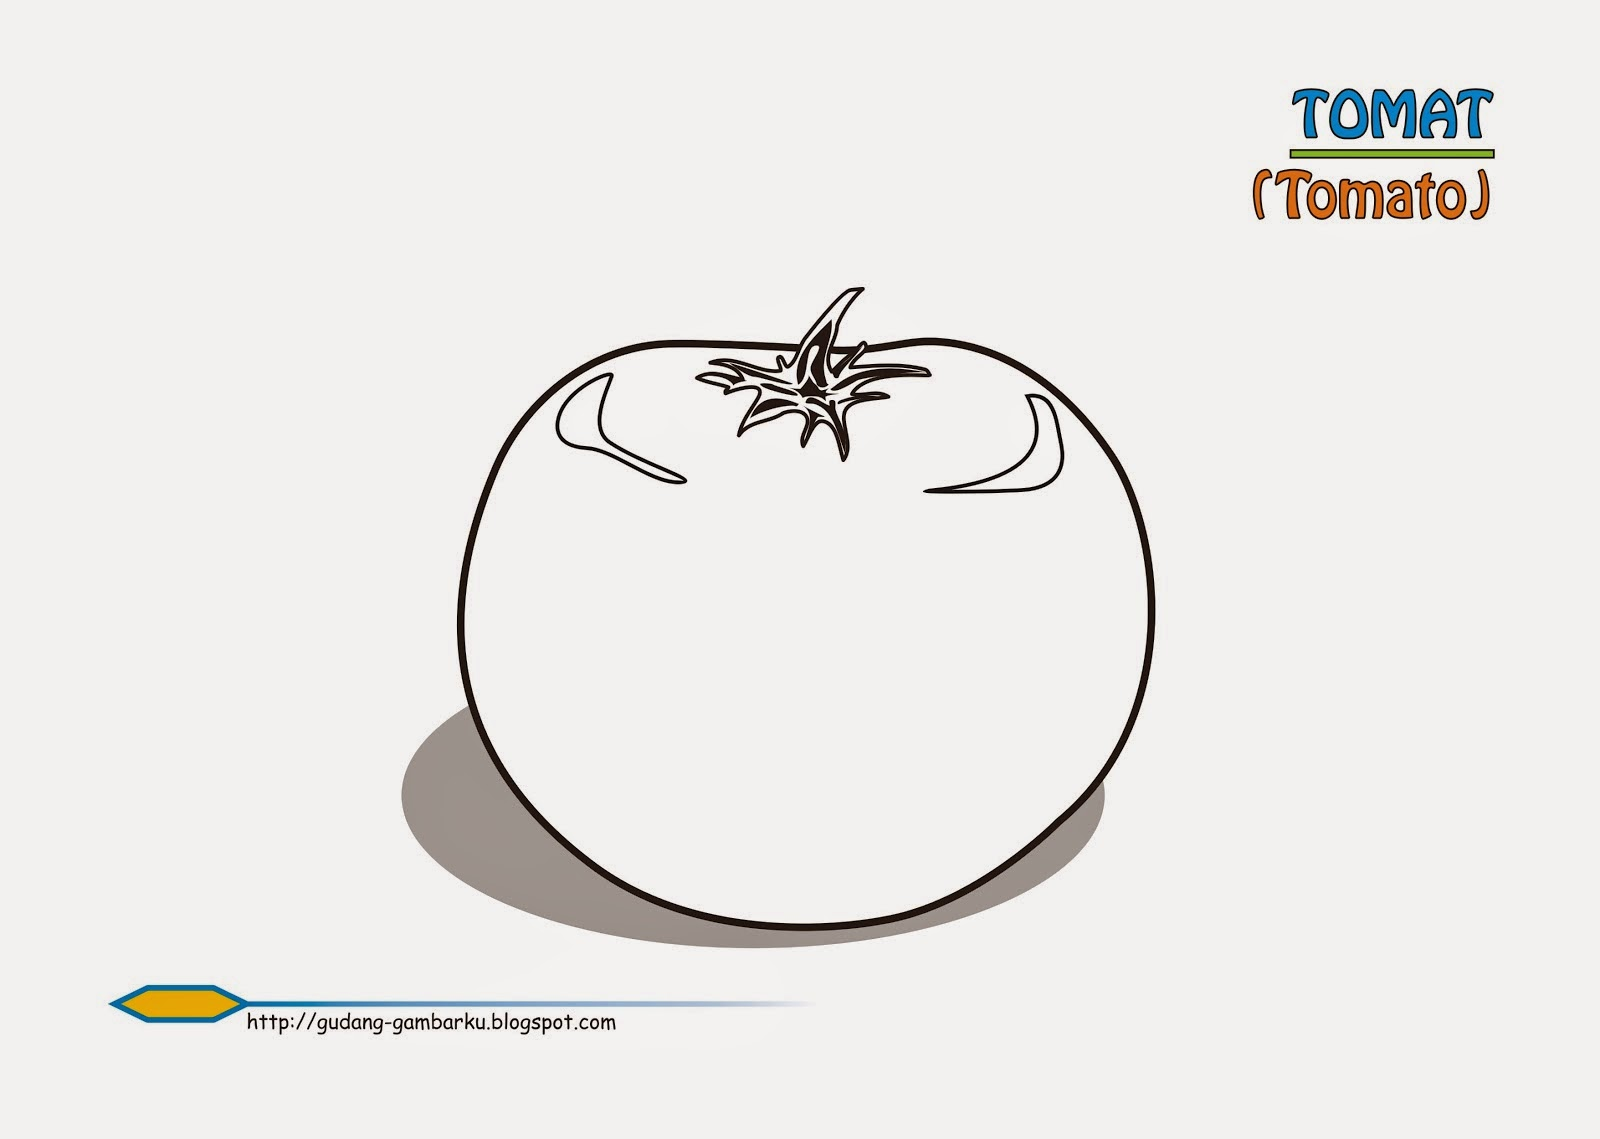 Gambar Mewarnai Tomat Gambar Mewarnai Lucu